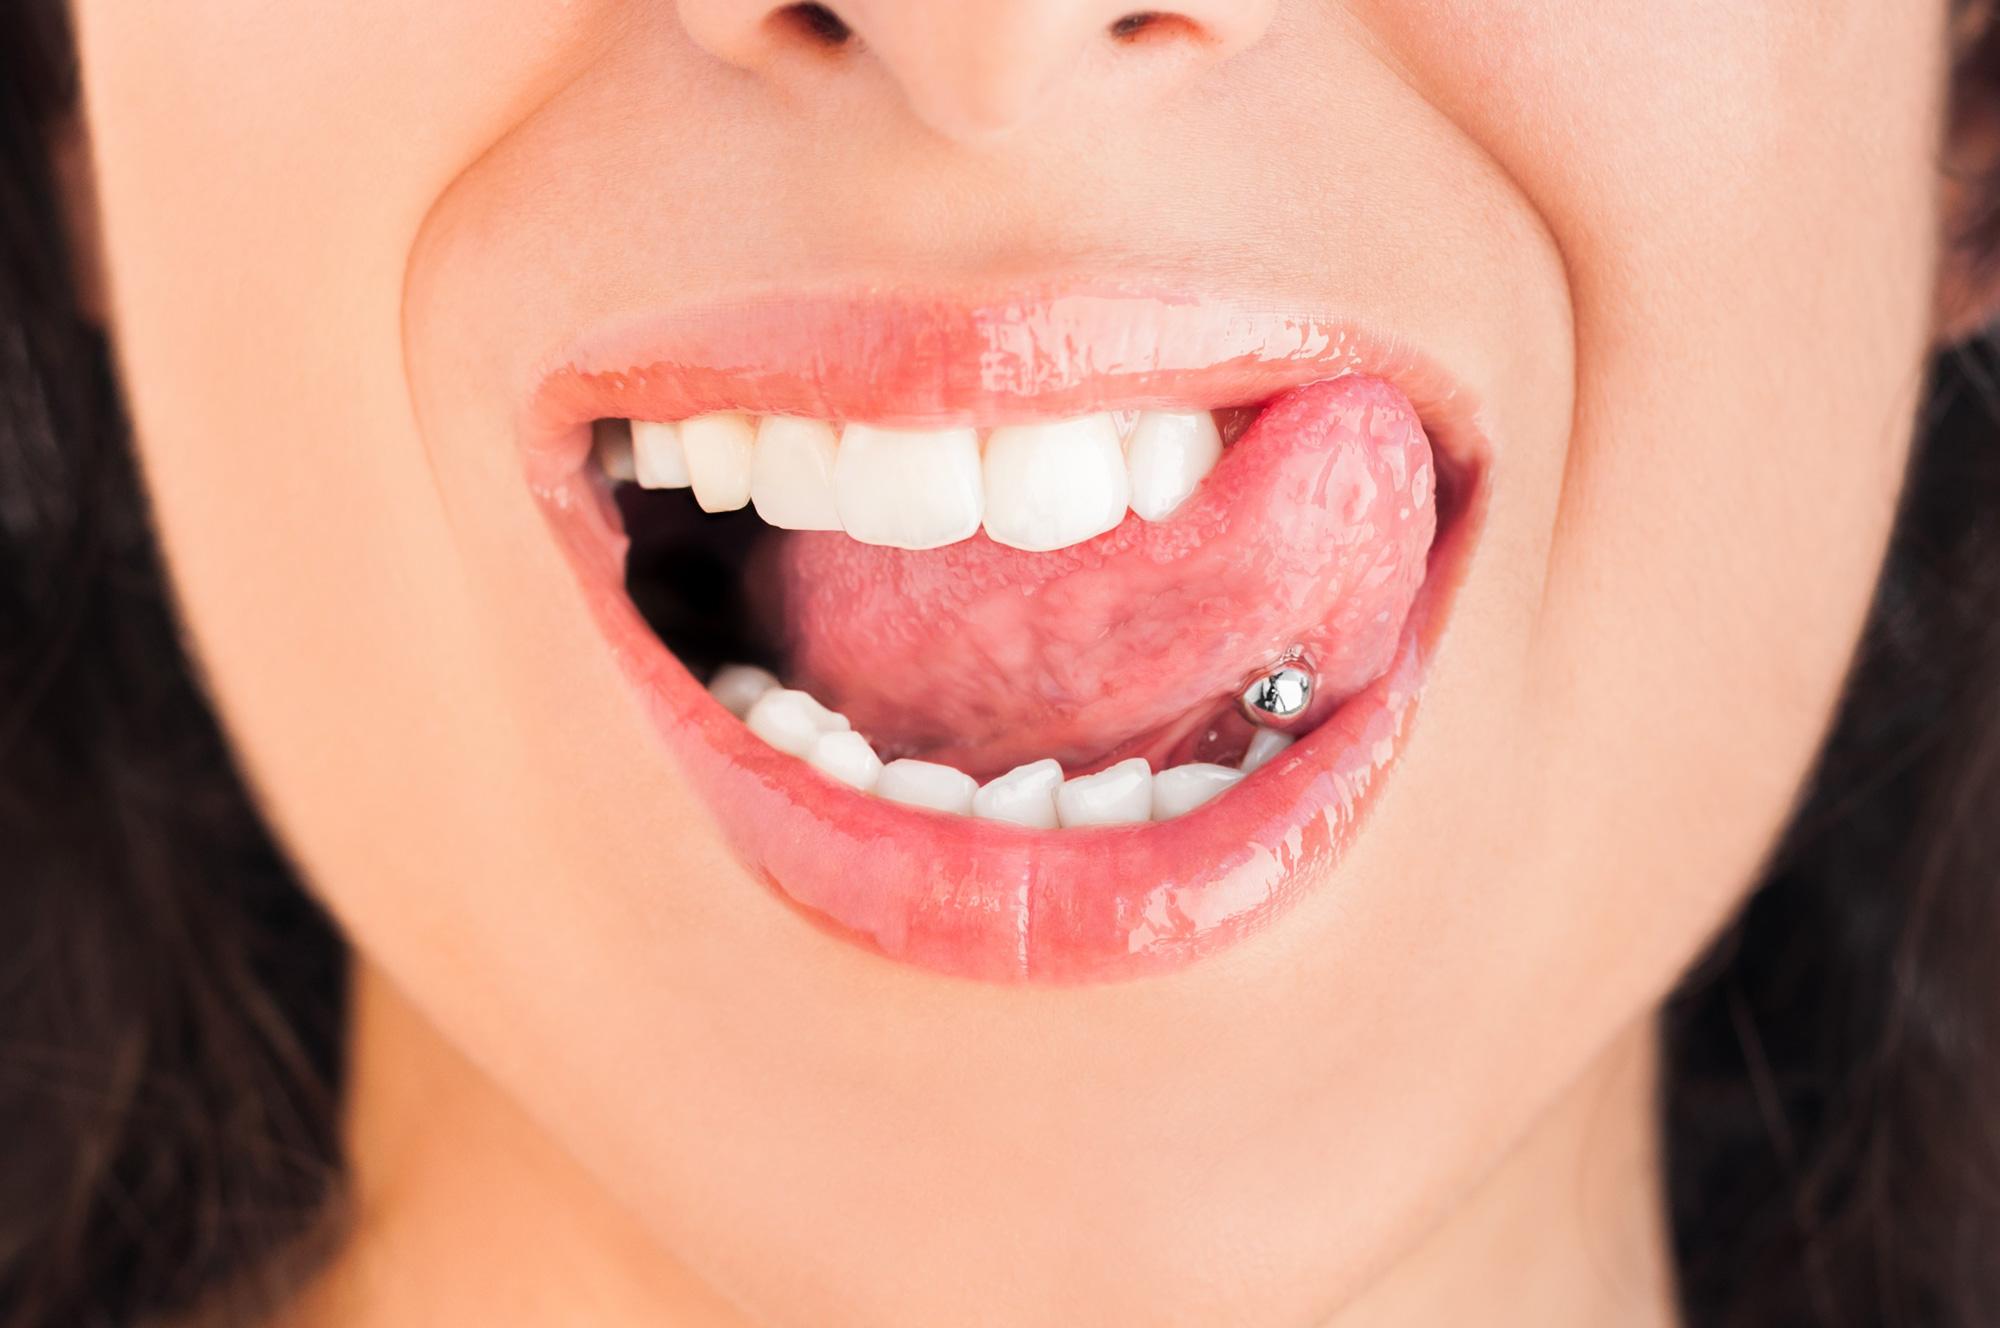 Baci e batteri: cosa ci dice la medicina